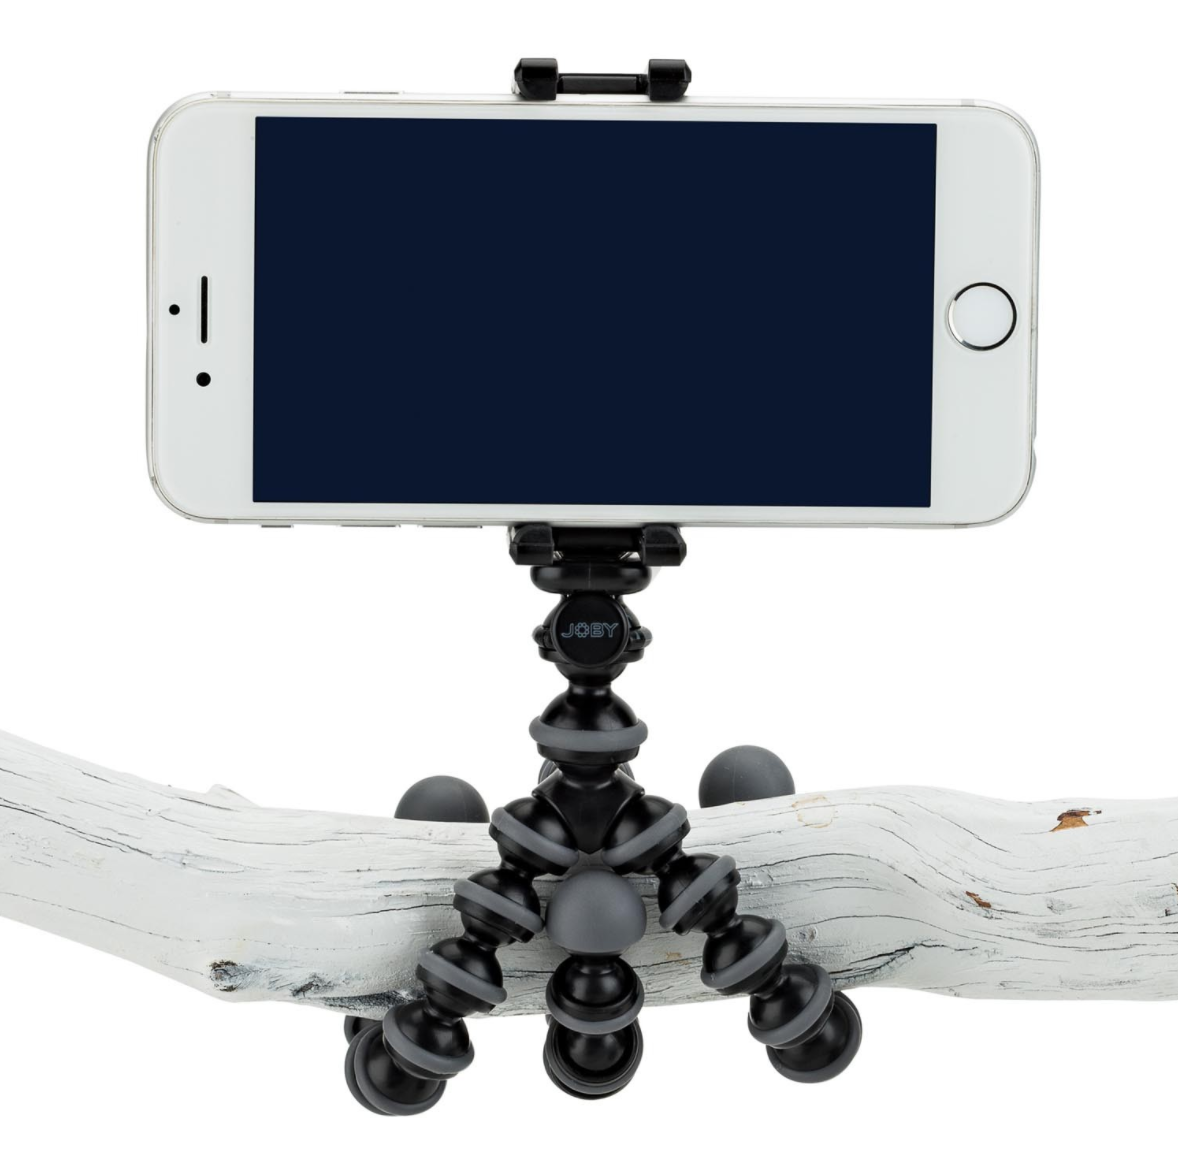 gorillapod snapchat tools professional creators use